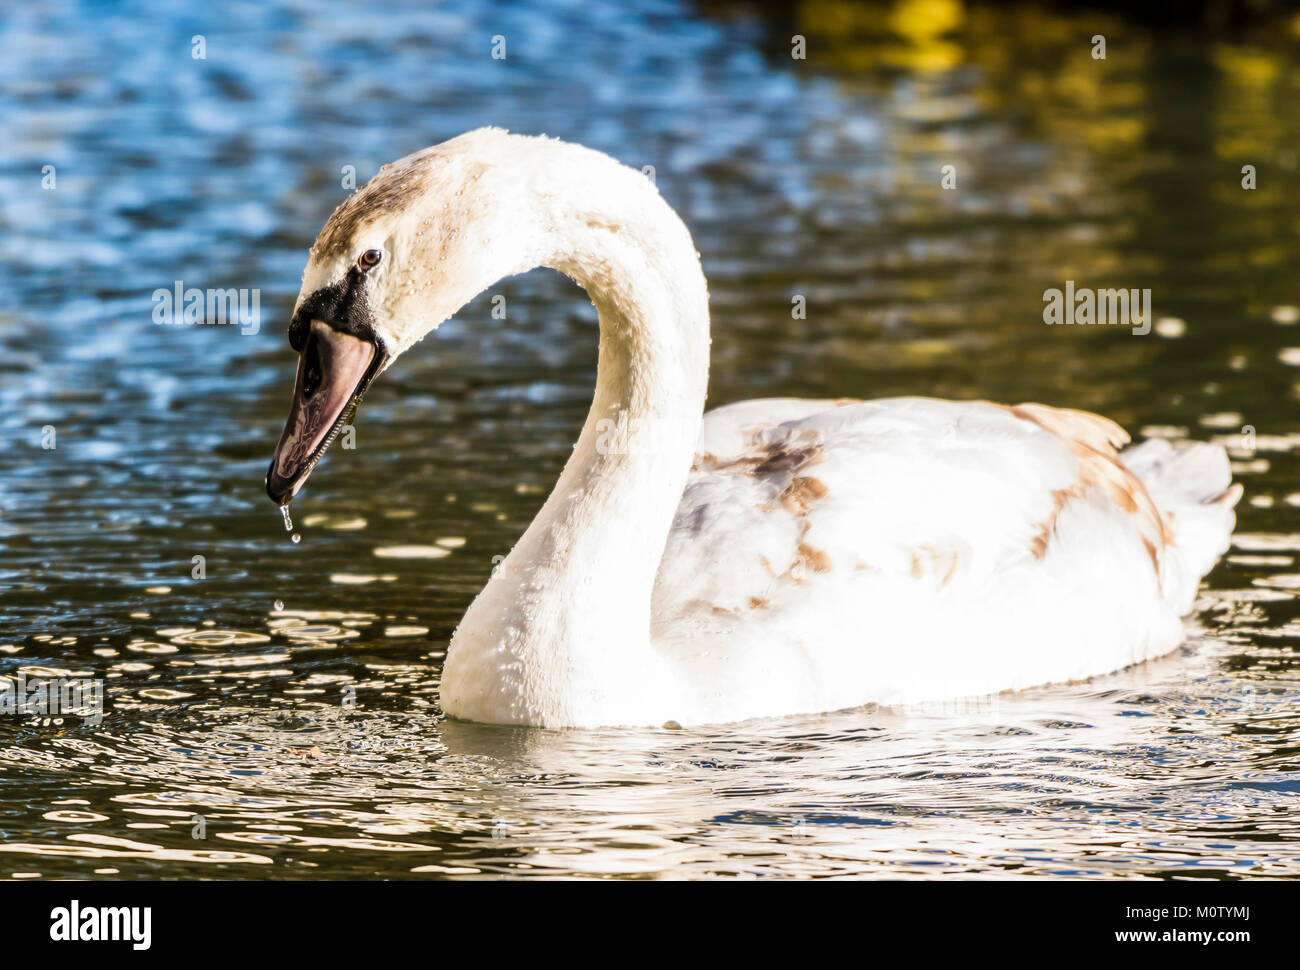 Cisne en el lago octogonal, Stowe, Buckinghamshire, REINO UNIDO Foto de stock